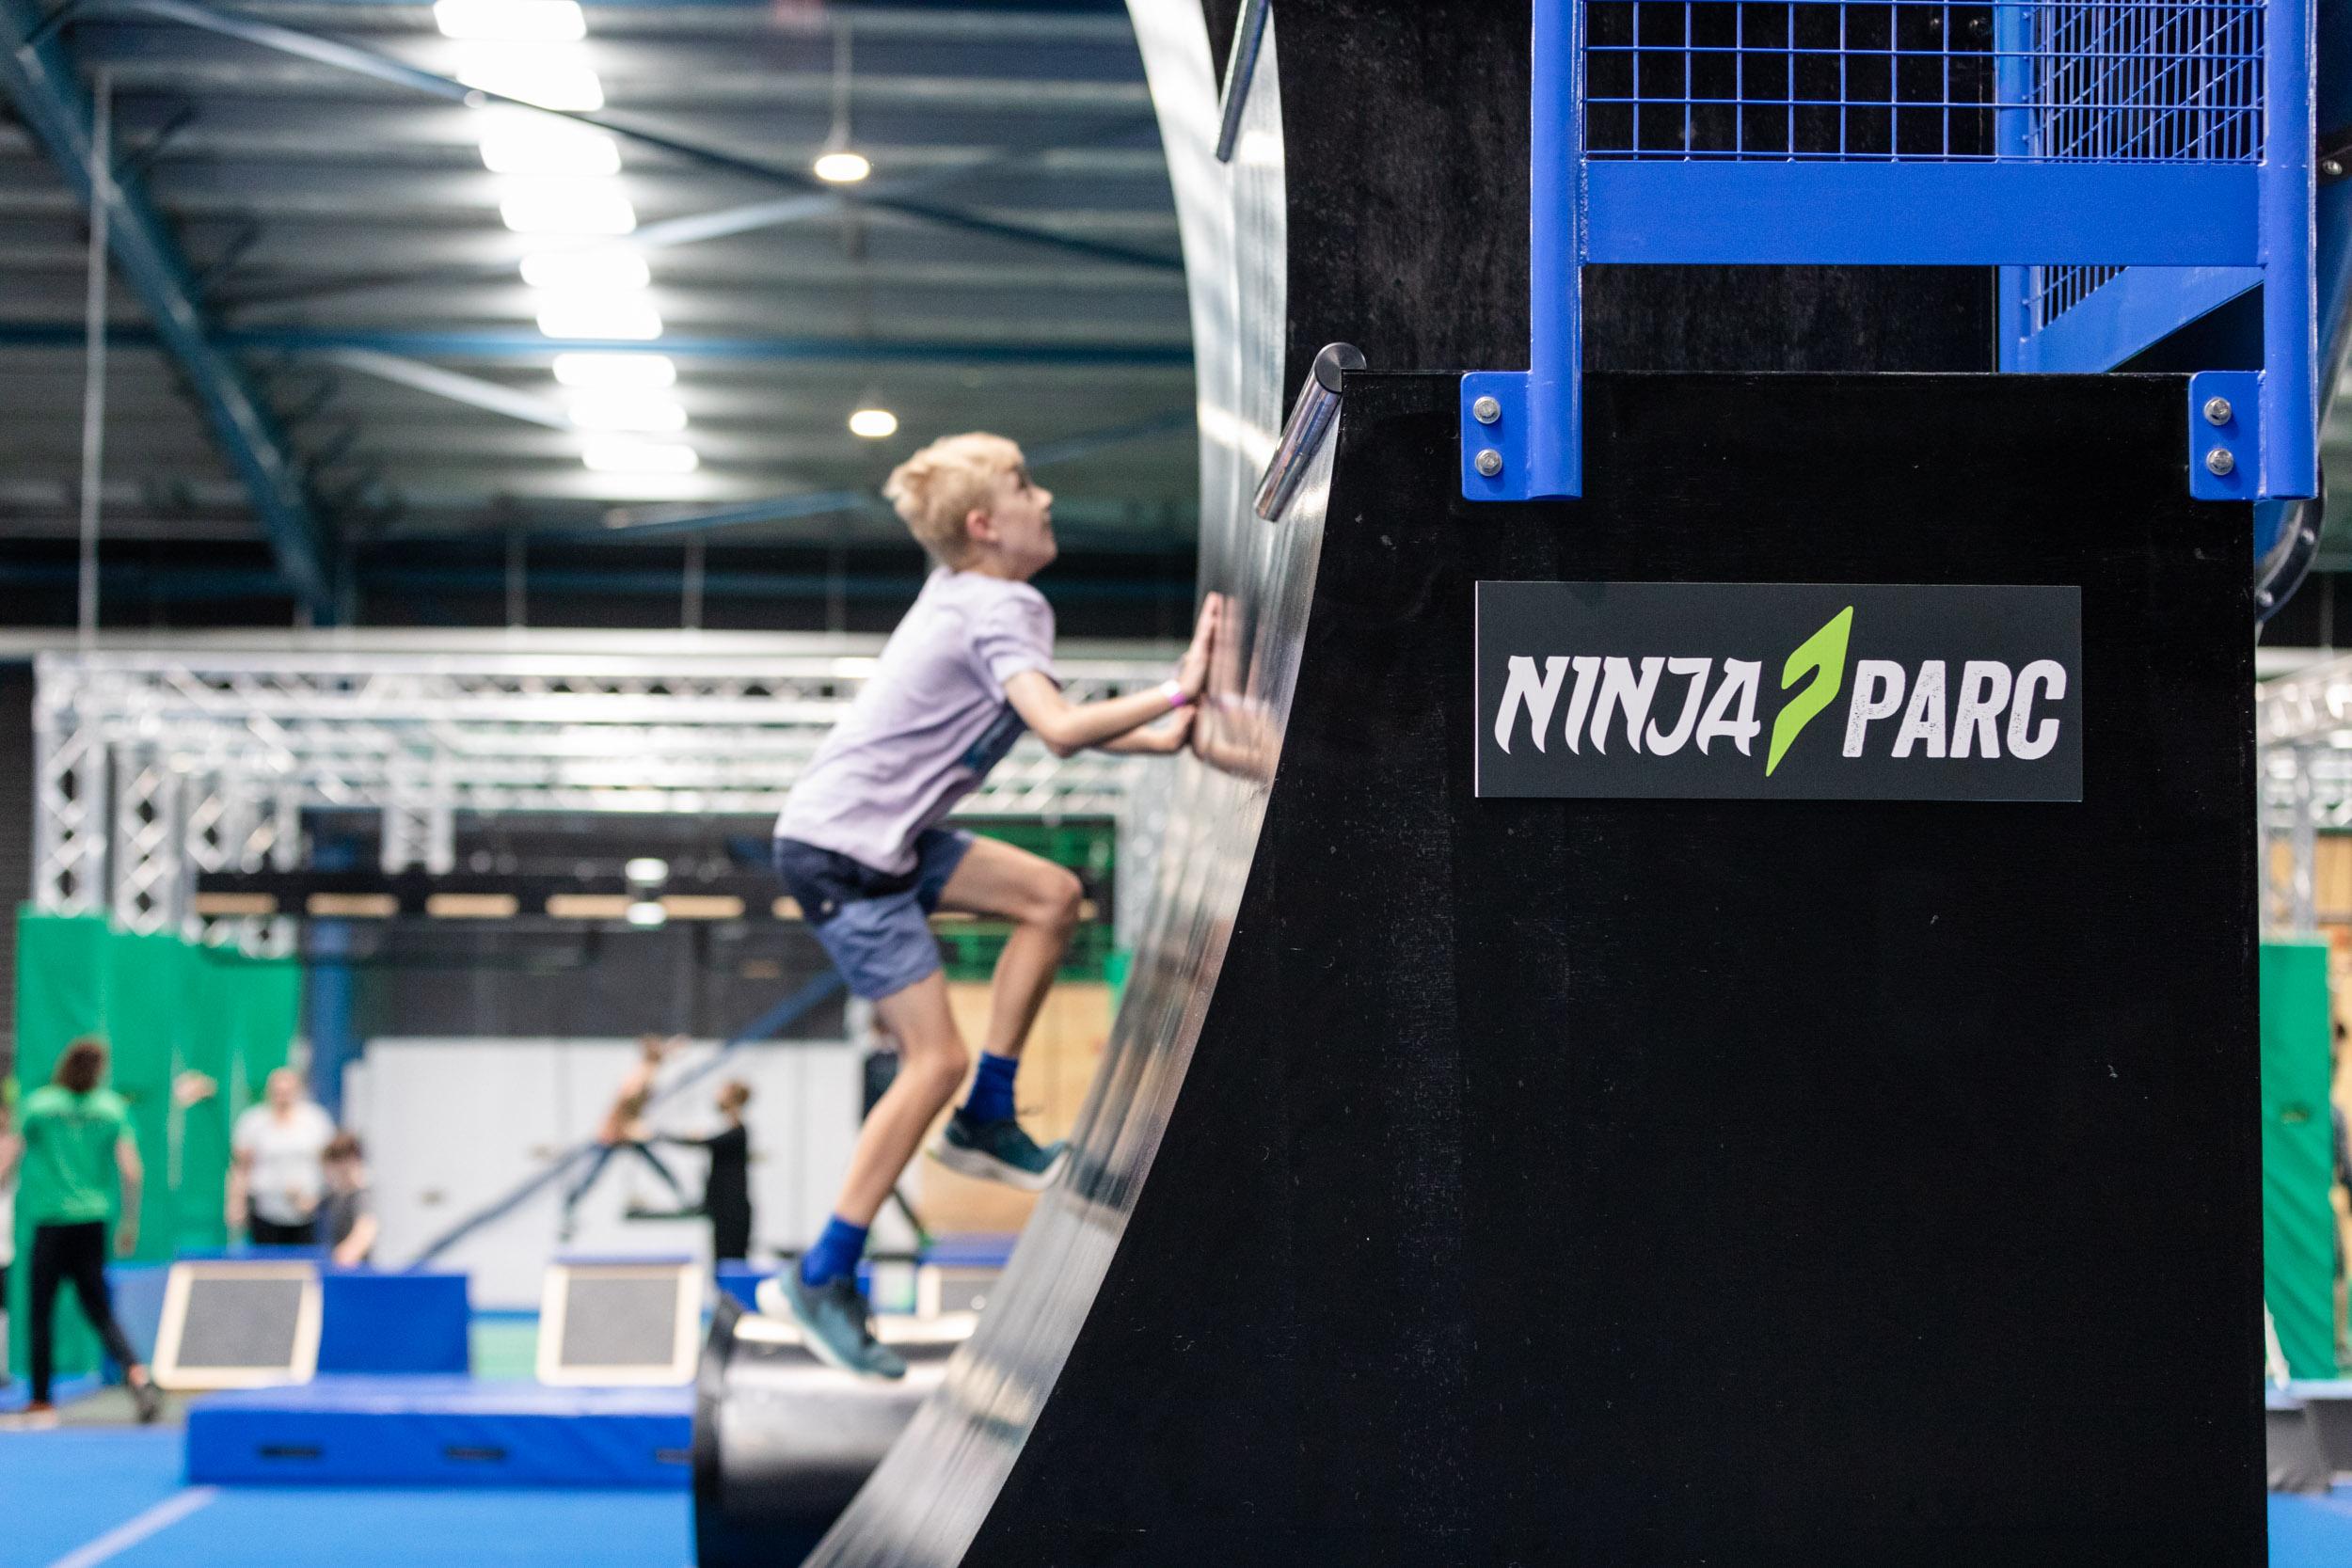 Ninja Parc Indoor Obstacle Course: Now open in Melbourne